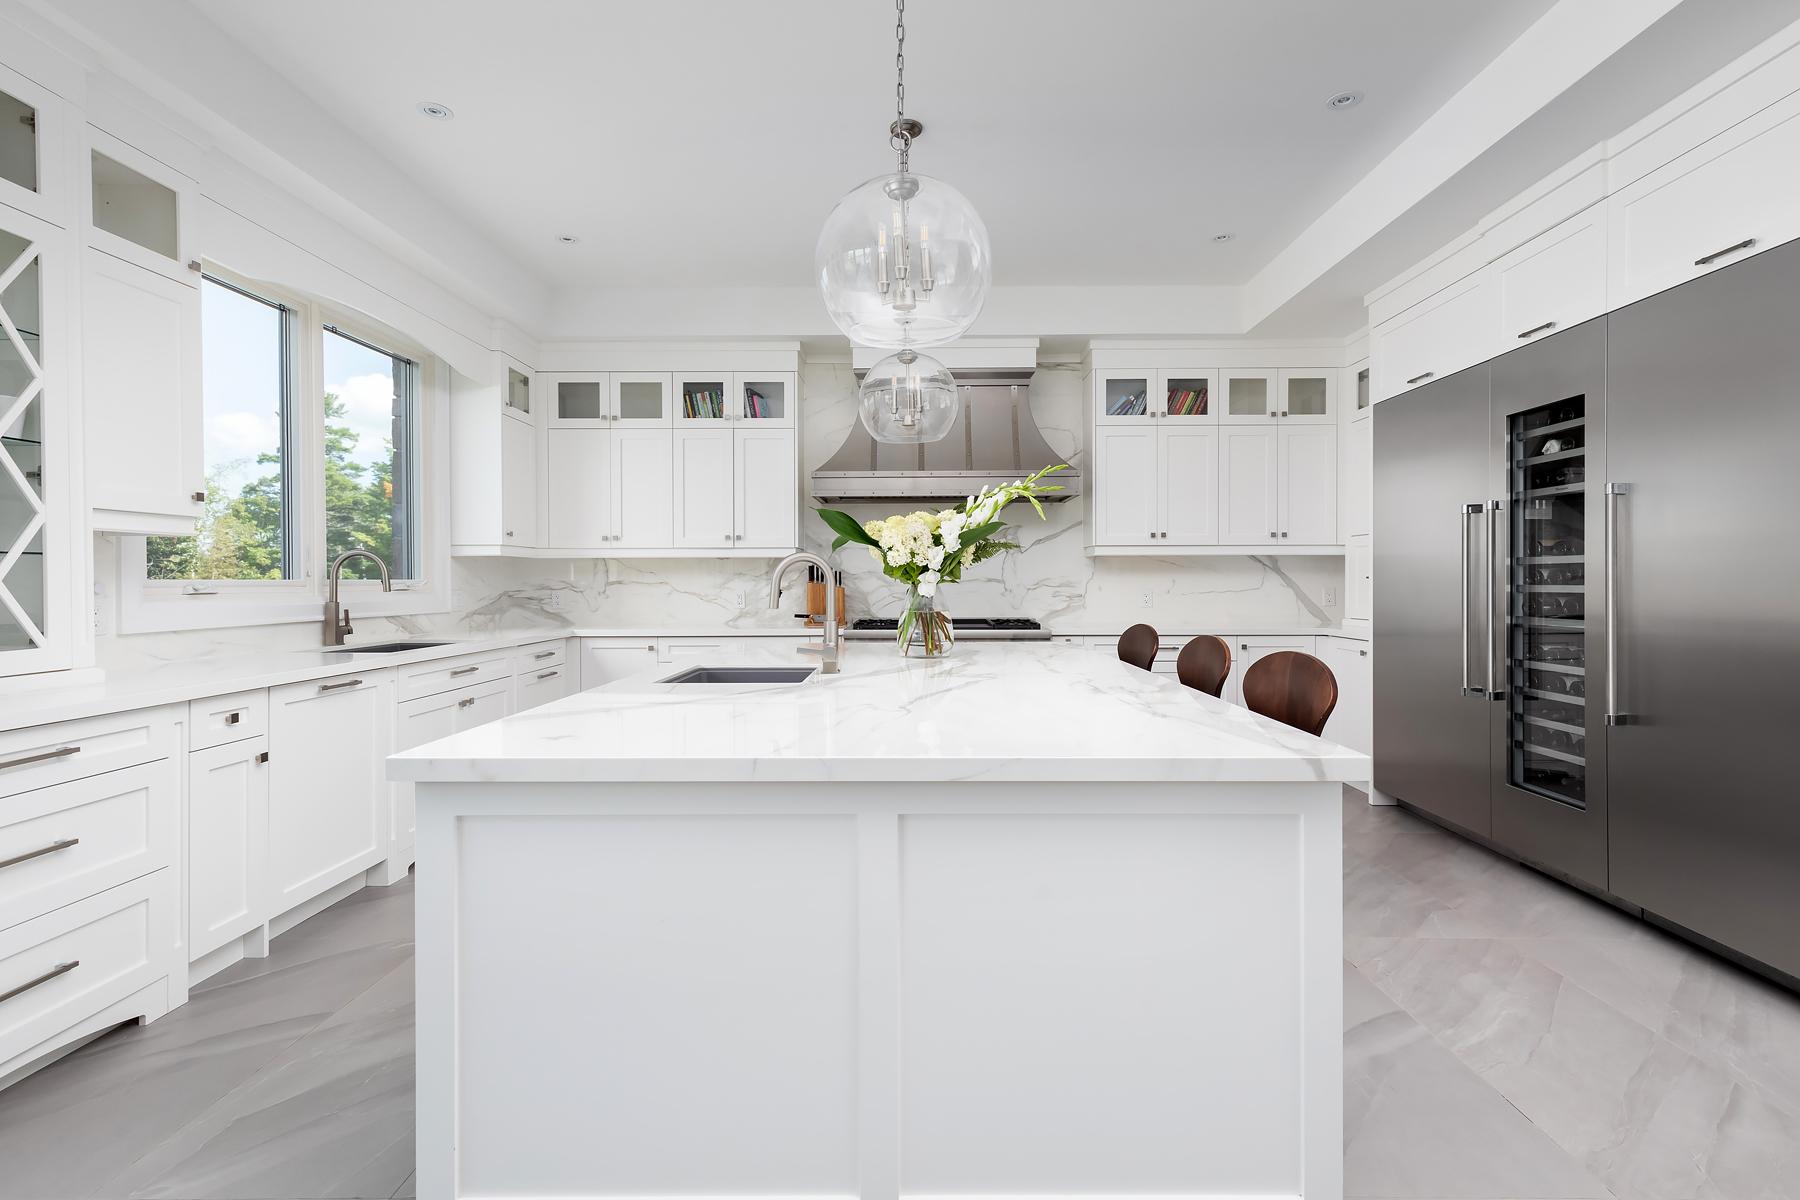 Floor - Paralello Grey | Kitchen - Estatuario E05